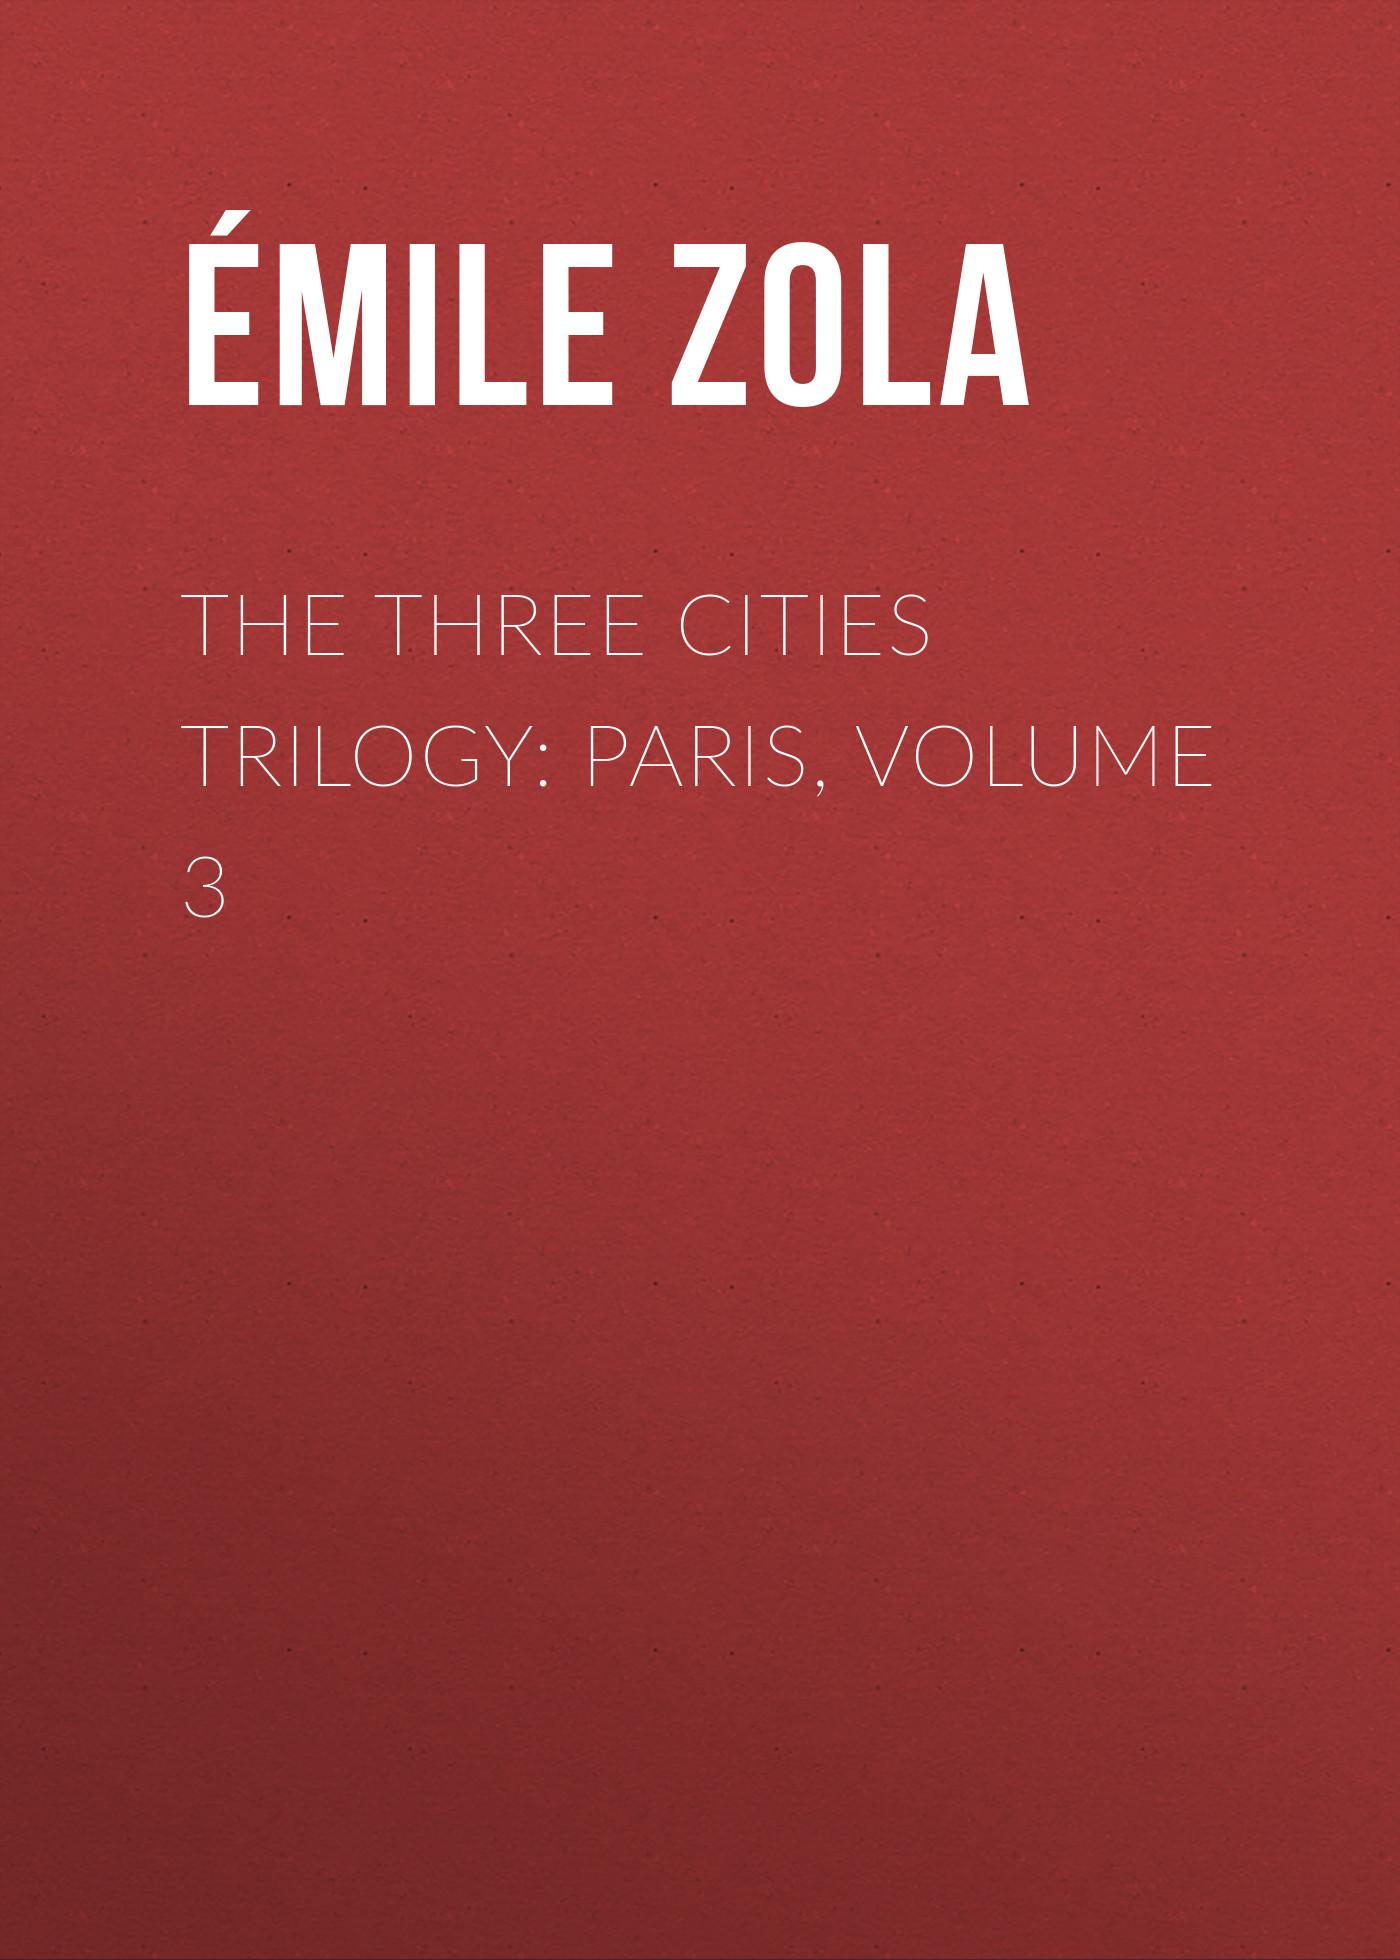 Эмиль Золя The Three Cities Trilogy: Paris, Volume 3 цена